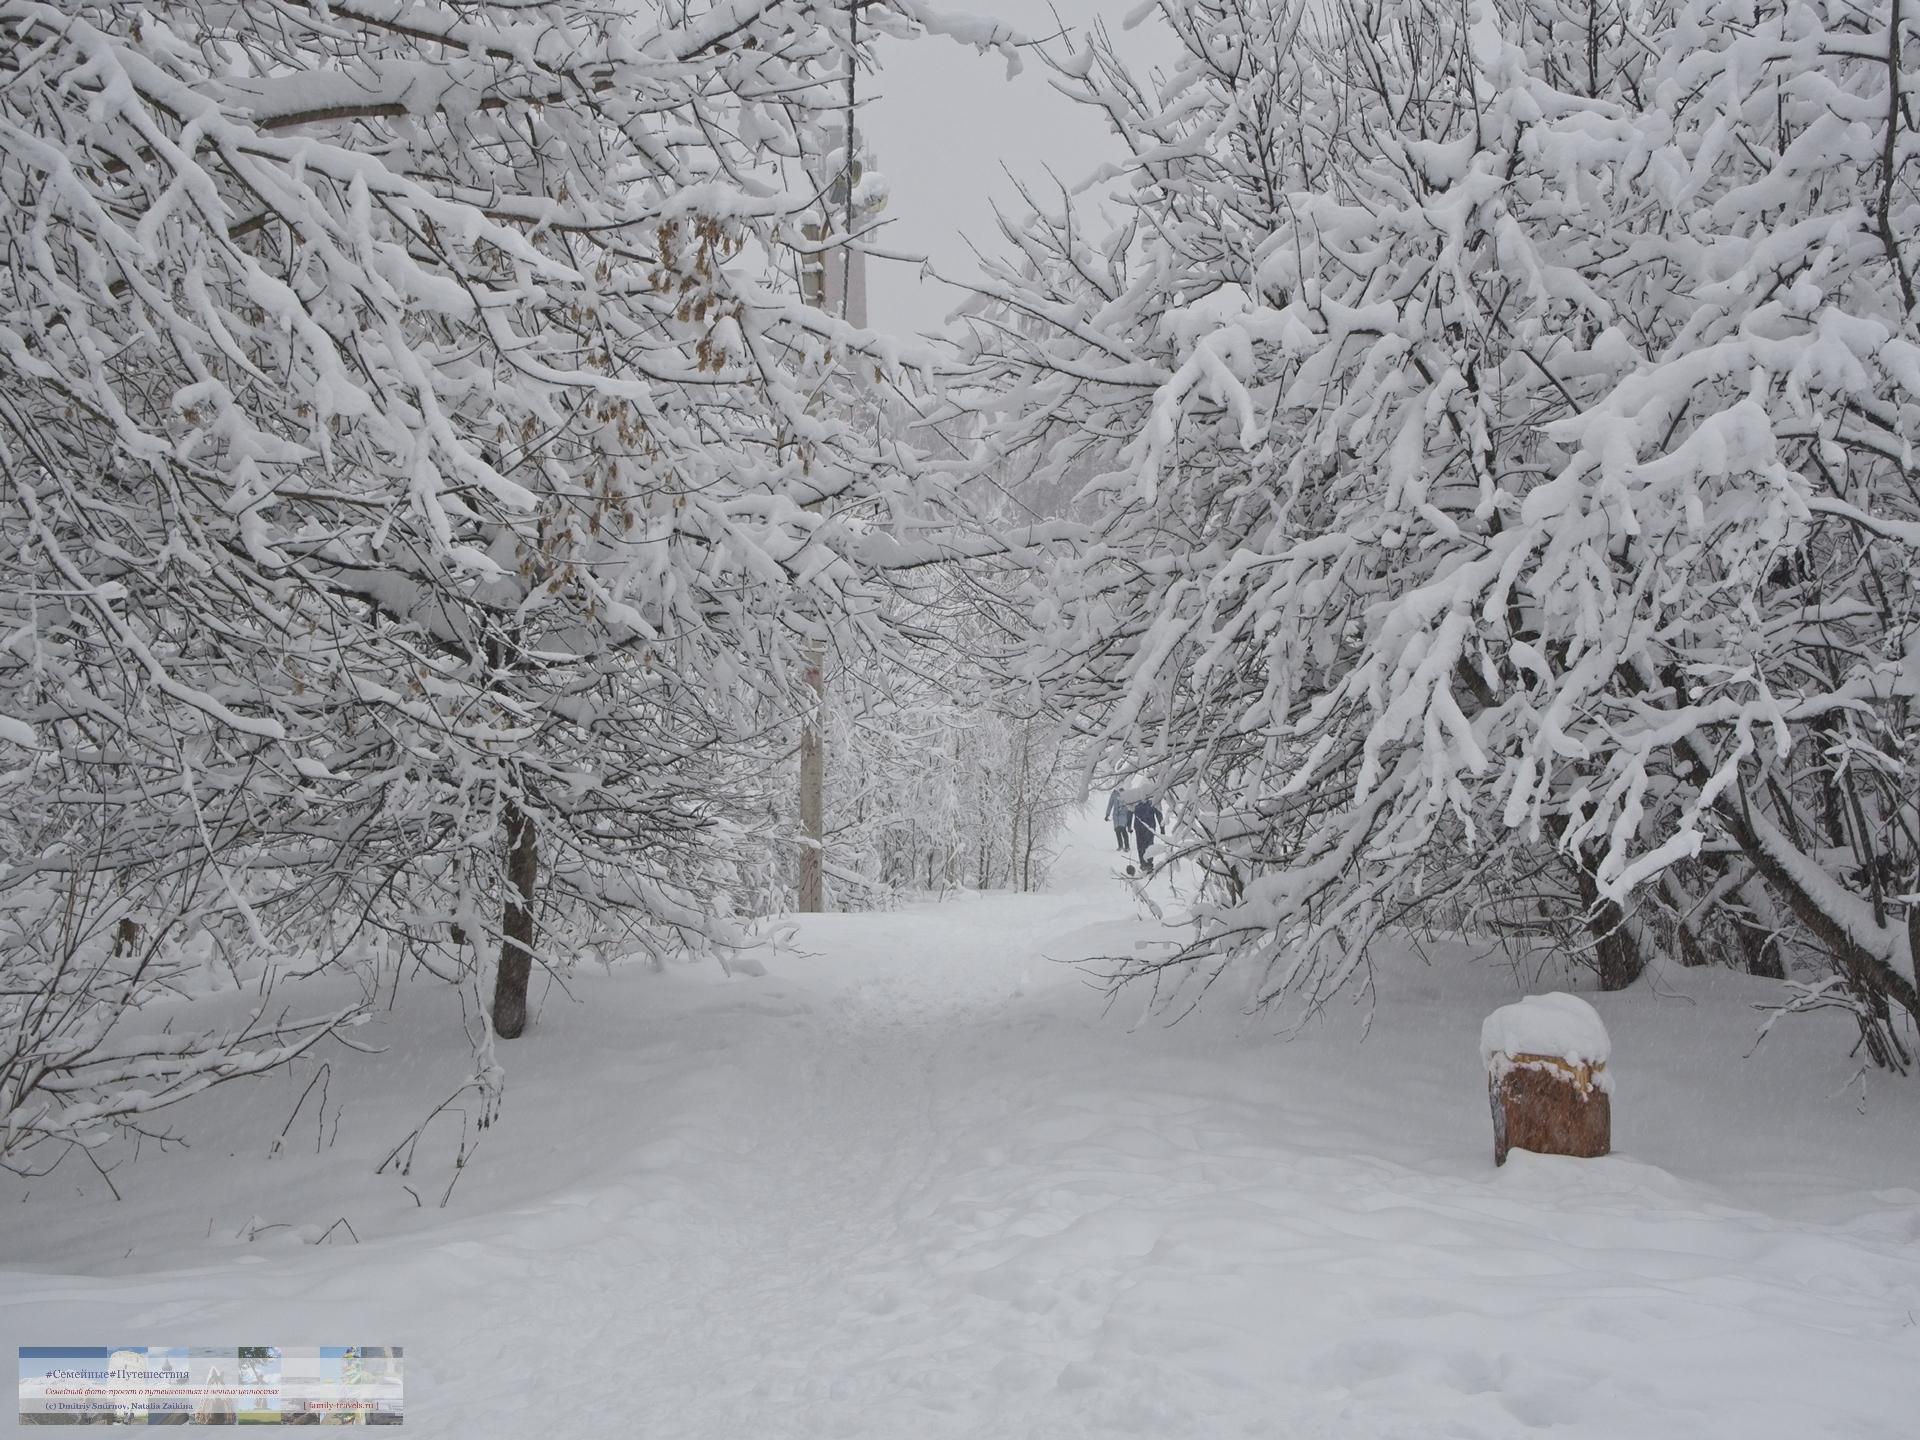 02042018-1438-Blog-046 Просто фото  Снегопад года